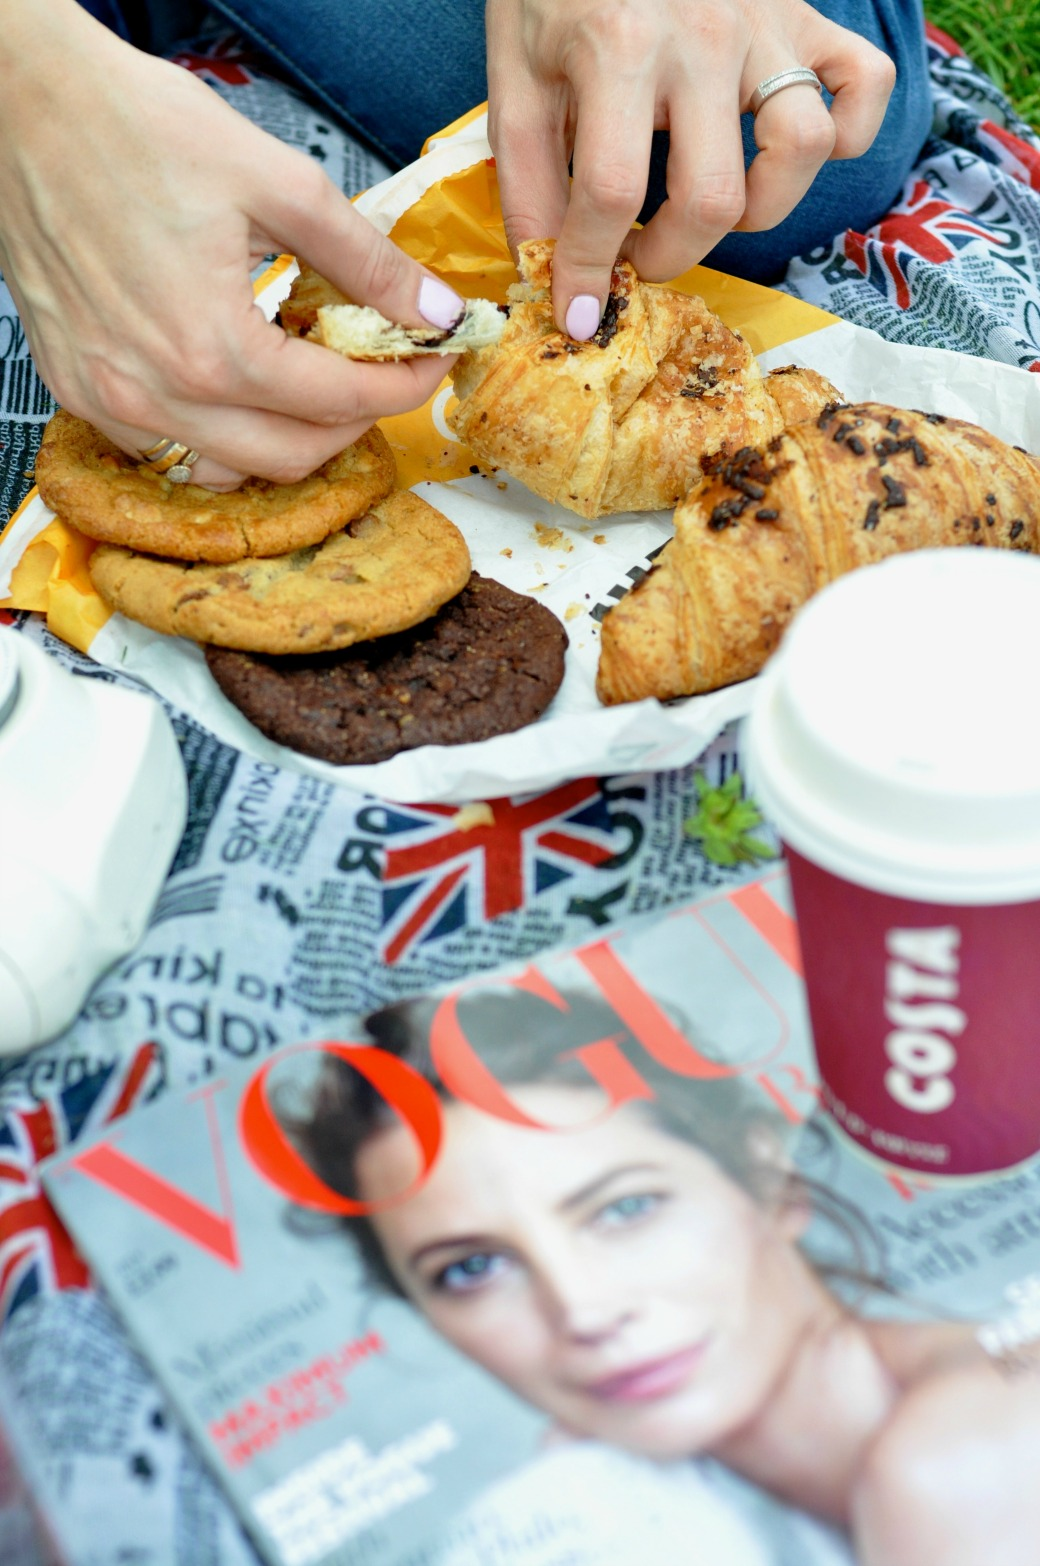 piknik hyde park londyn